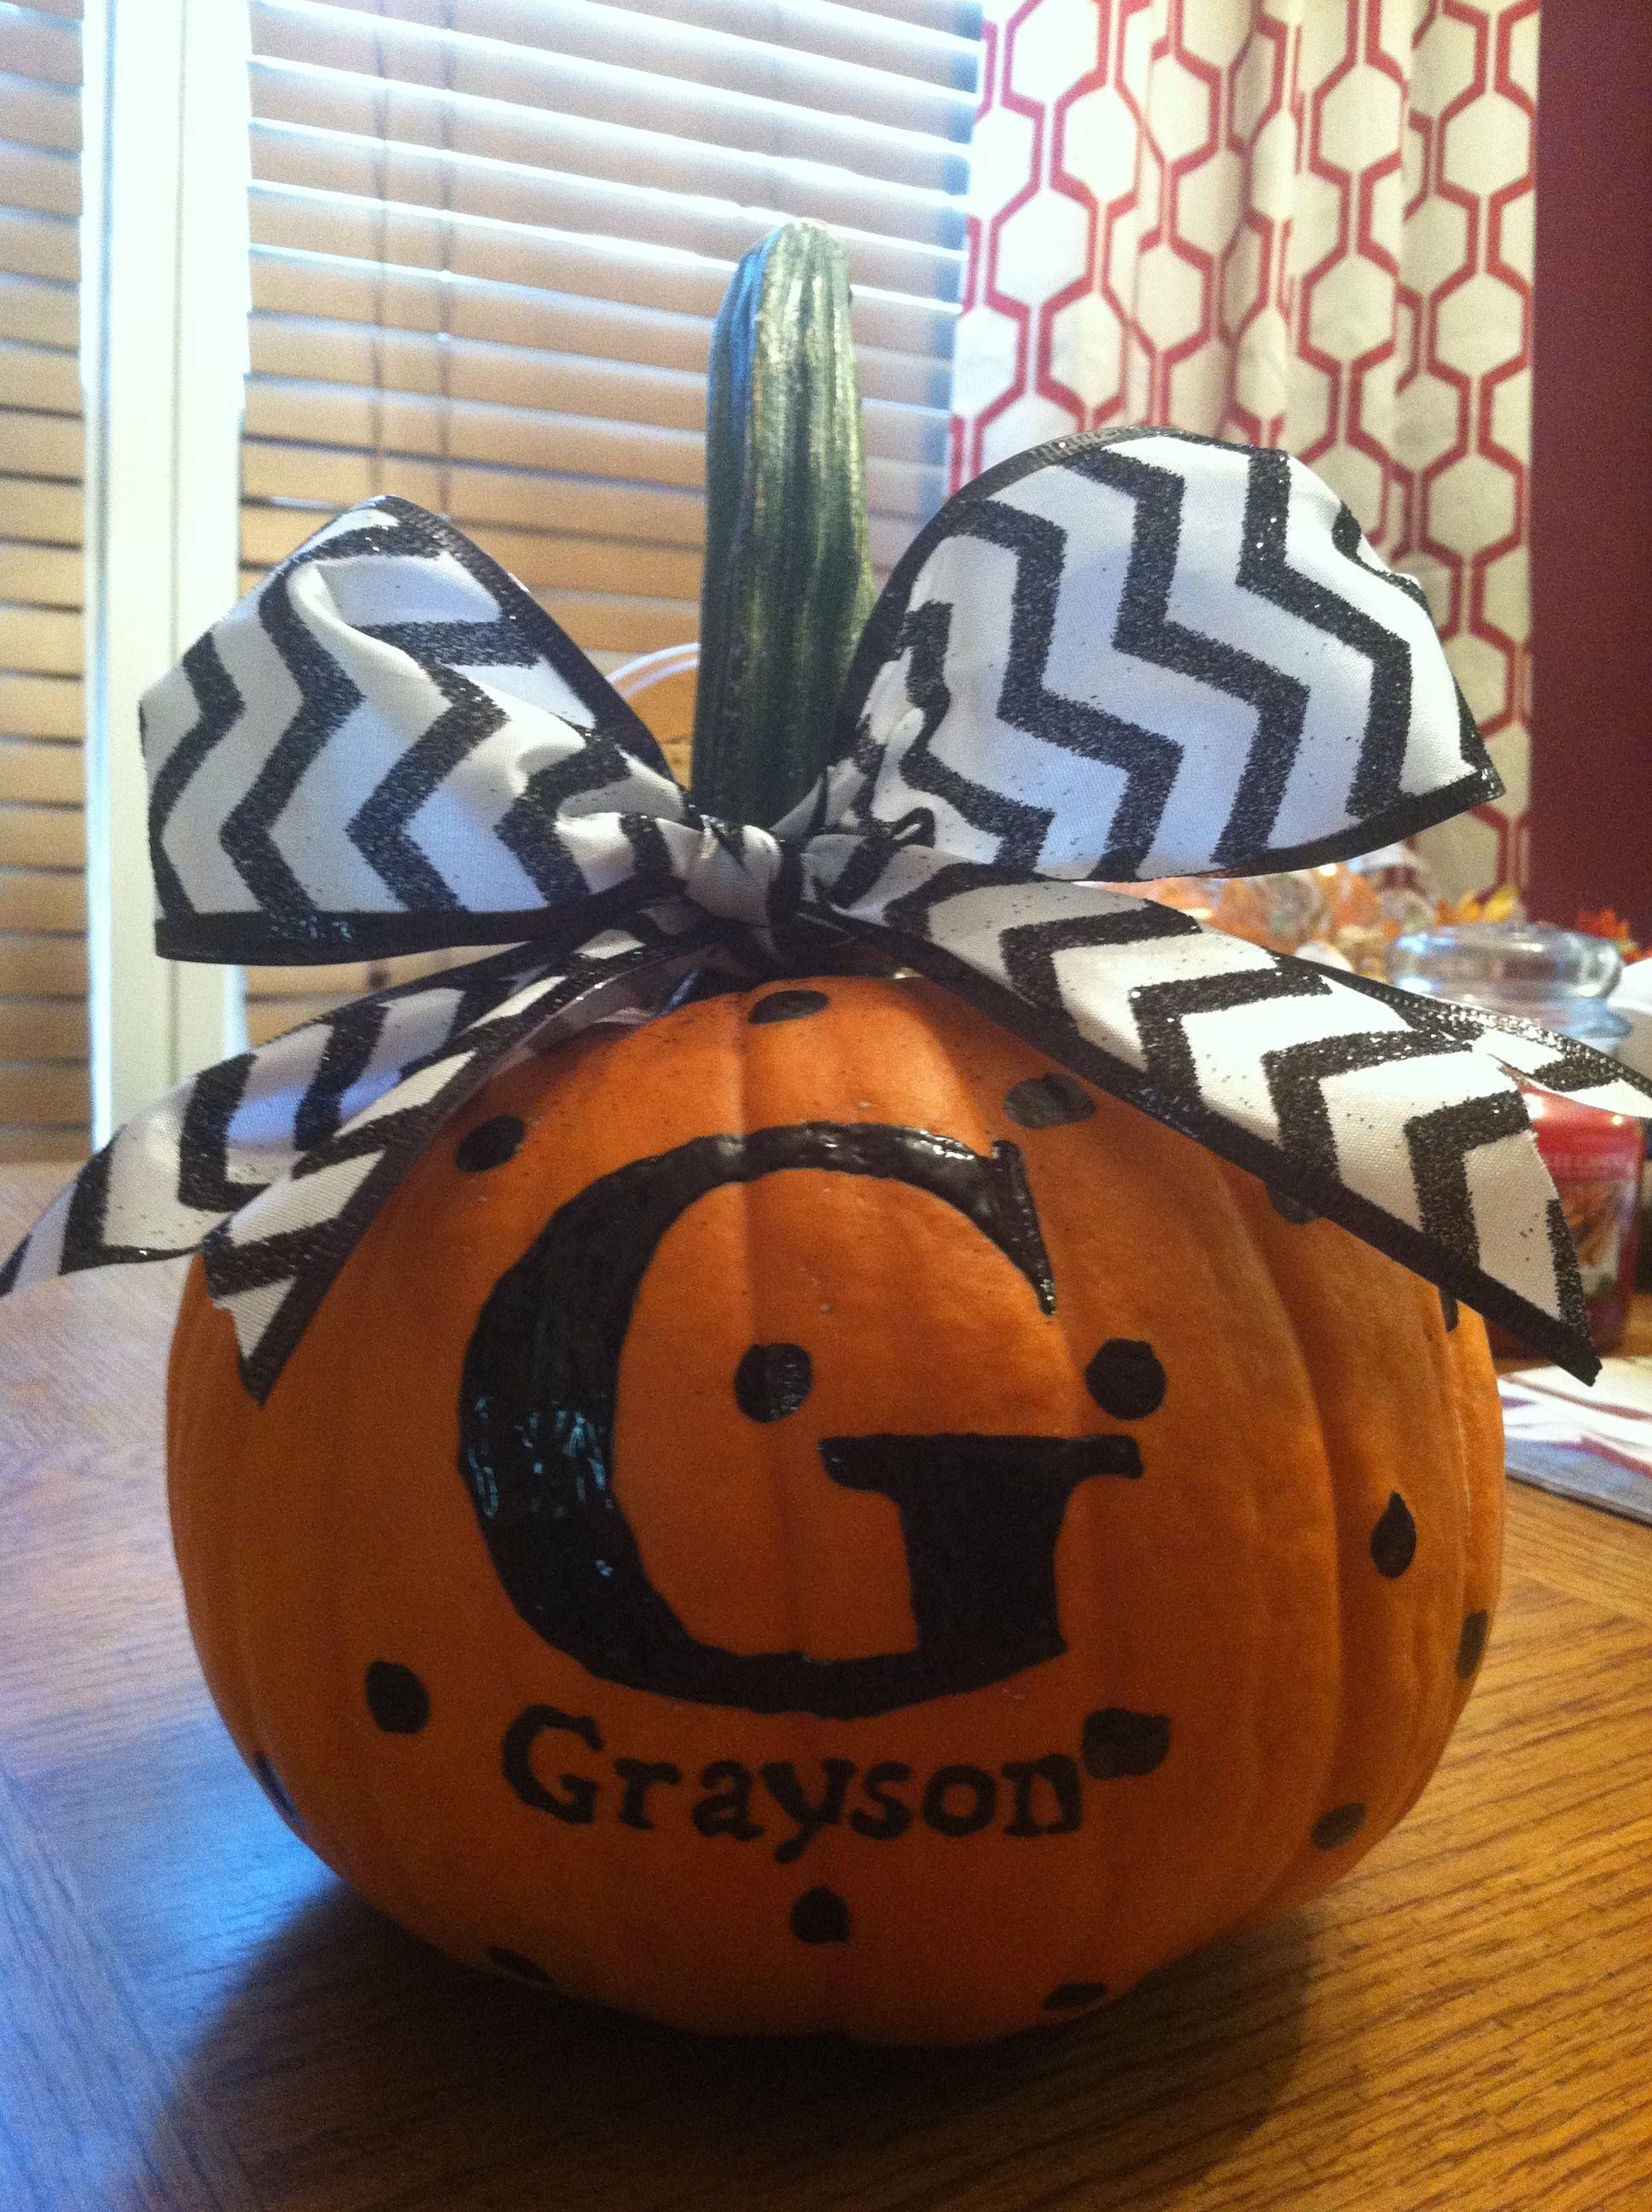 Personalized Fall pumpkin | Fall | Pinterest | Fall pumpkins ...